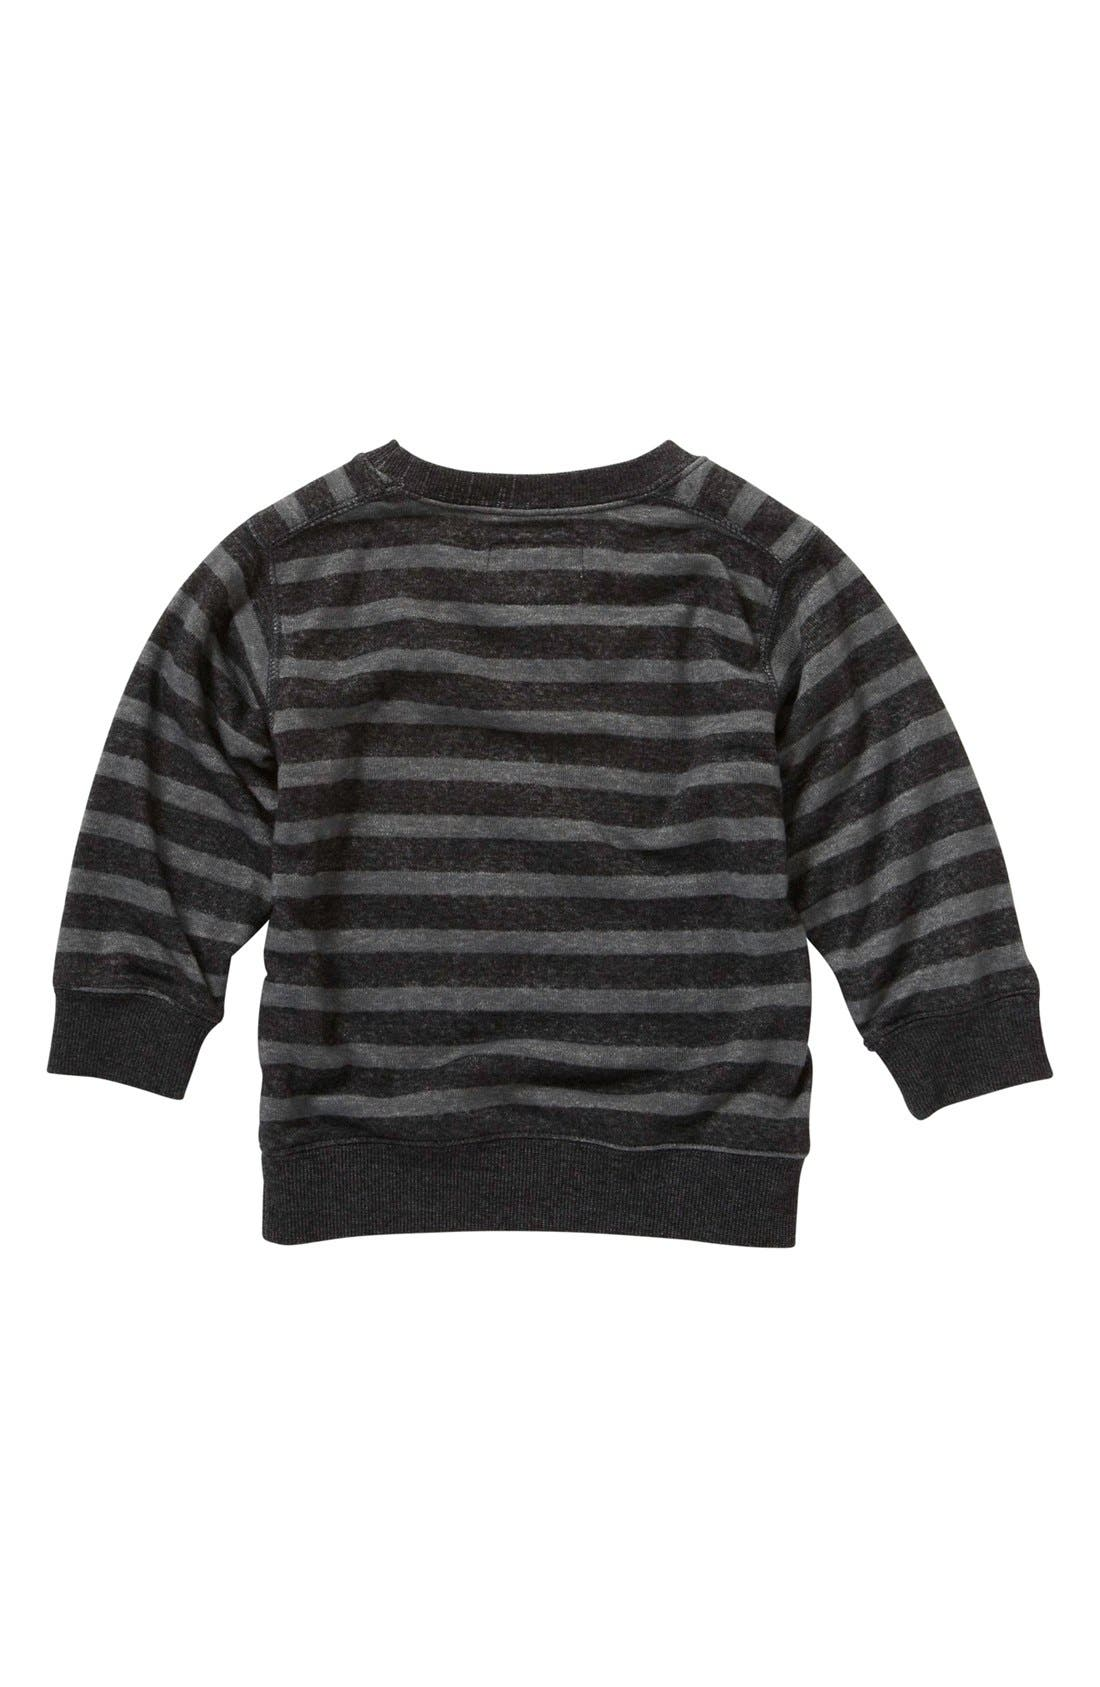 Alternate Image 2  - Quiksilver 'Spiff Tiff' Sweatshirt (Baby Boys)